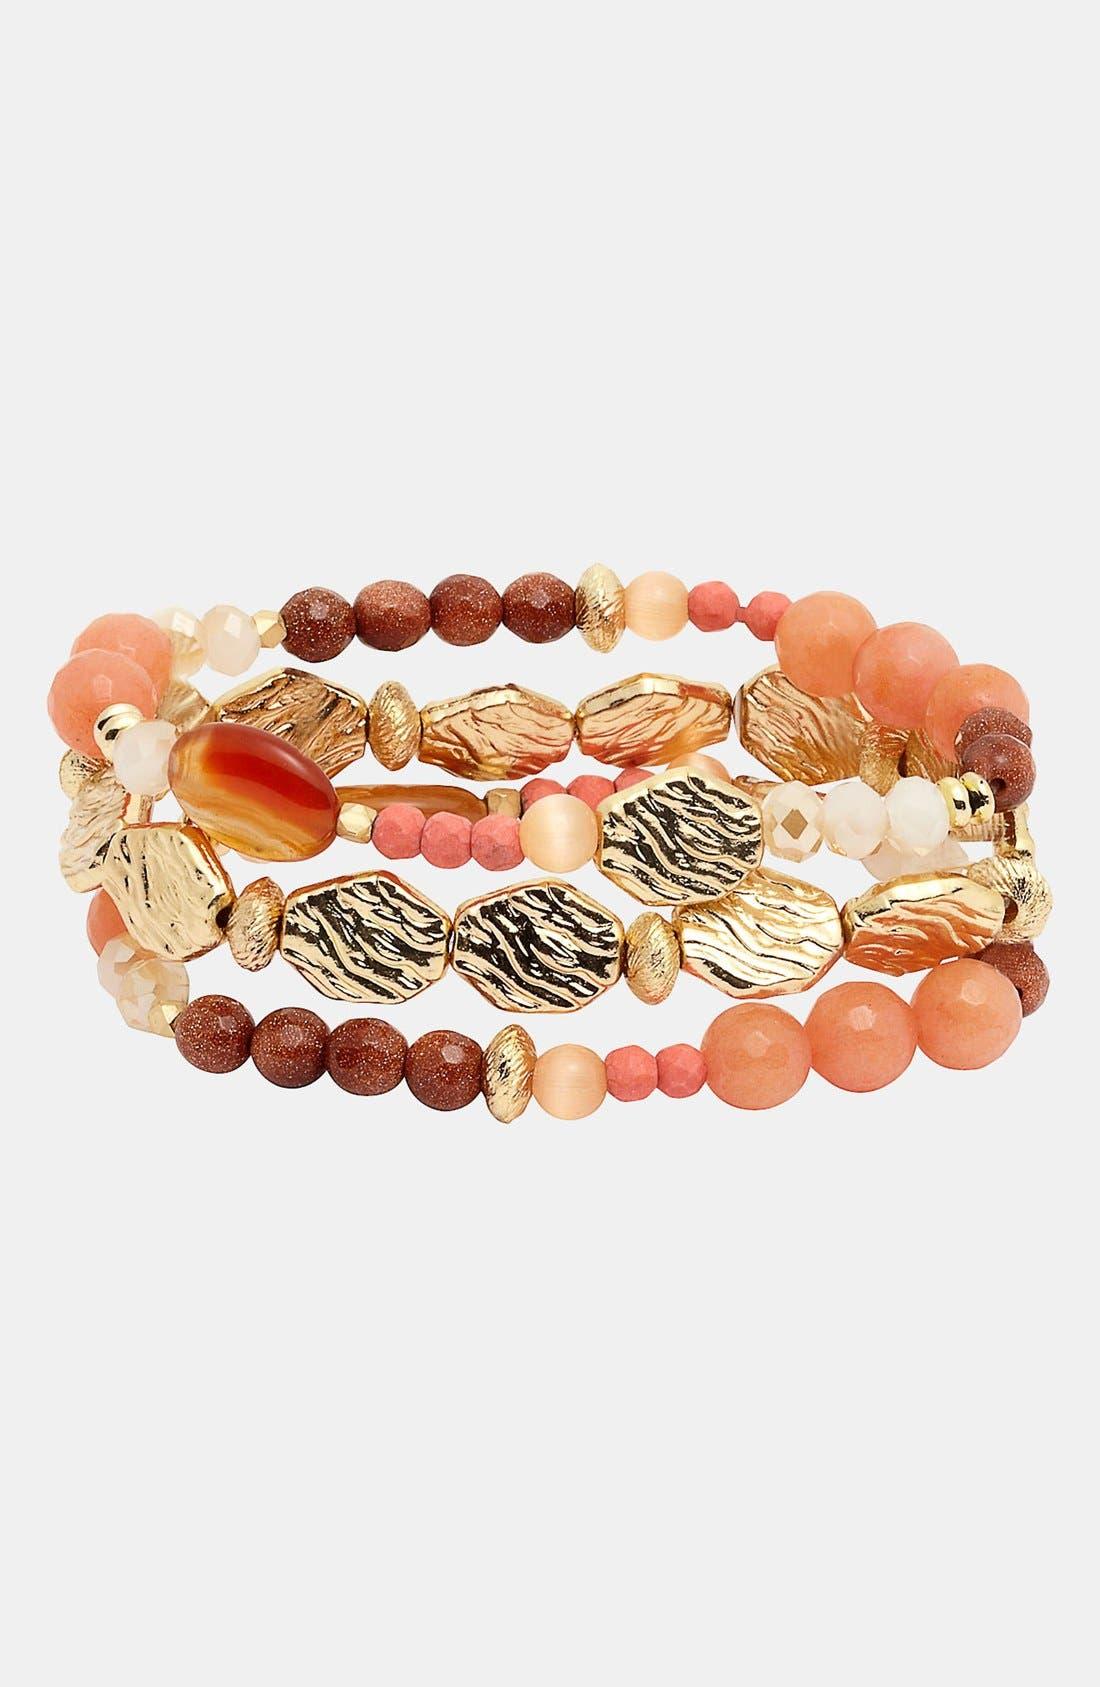 Alternate Image 1 Selected - Nordstrom 'Pebbles' Beaded Stretch Bracelets (Set of 3)